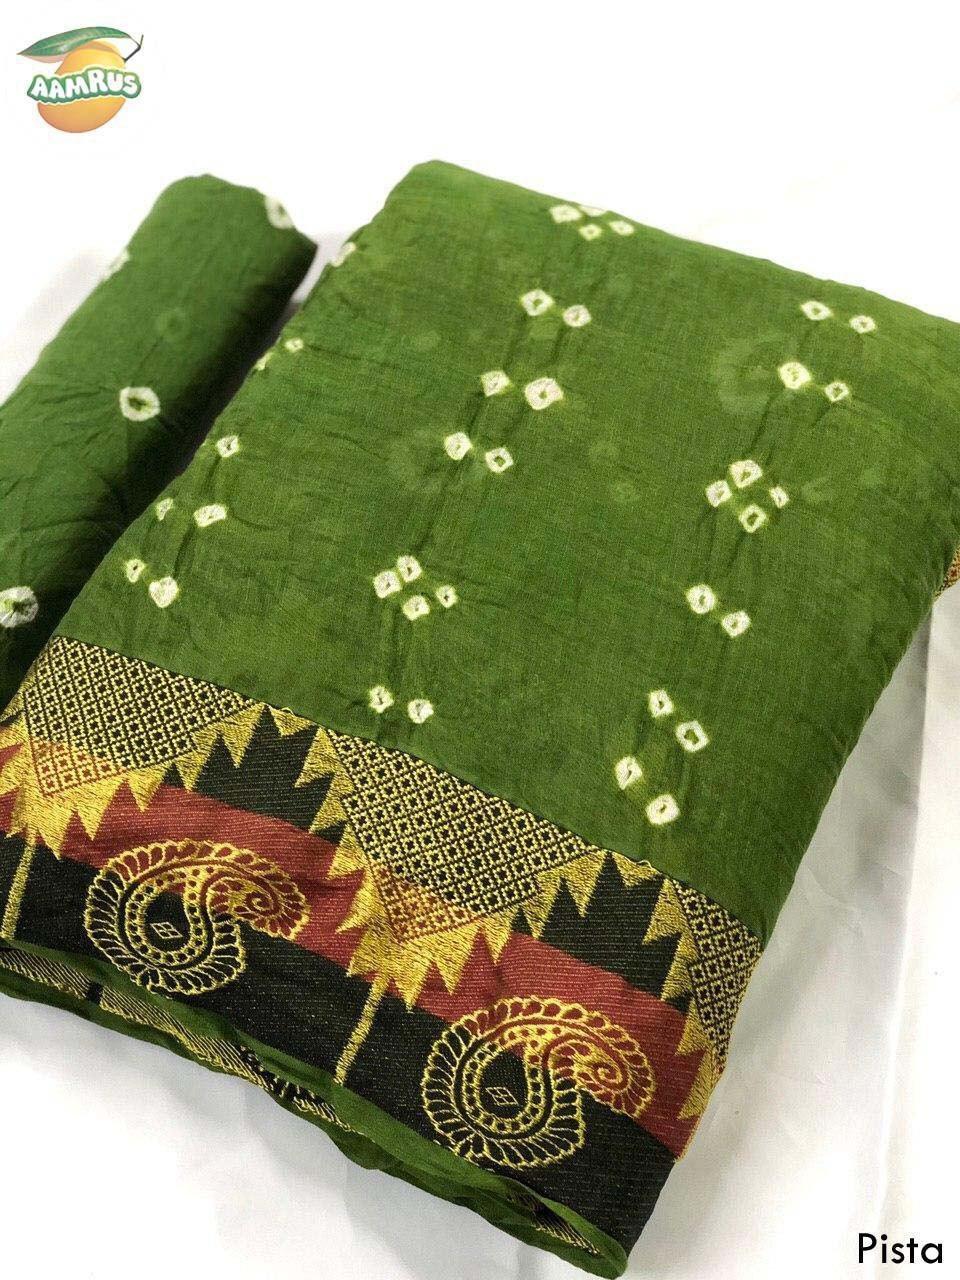 Ssm-Aamrus-Pure-Cotton-Saree-11